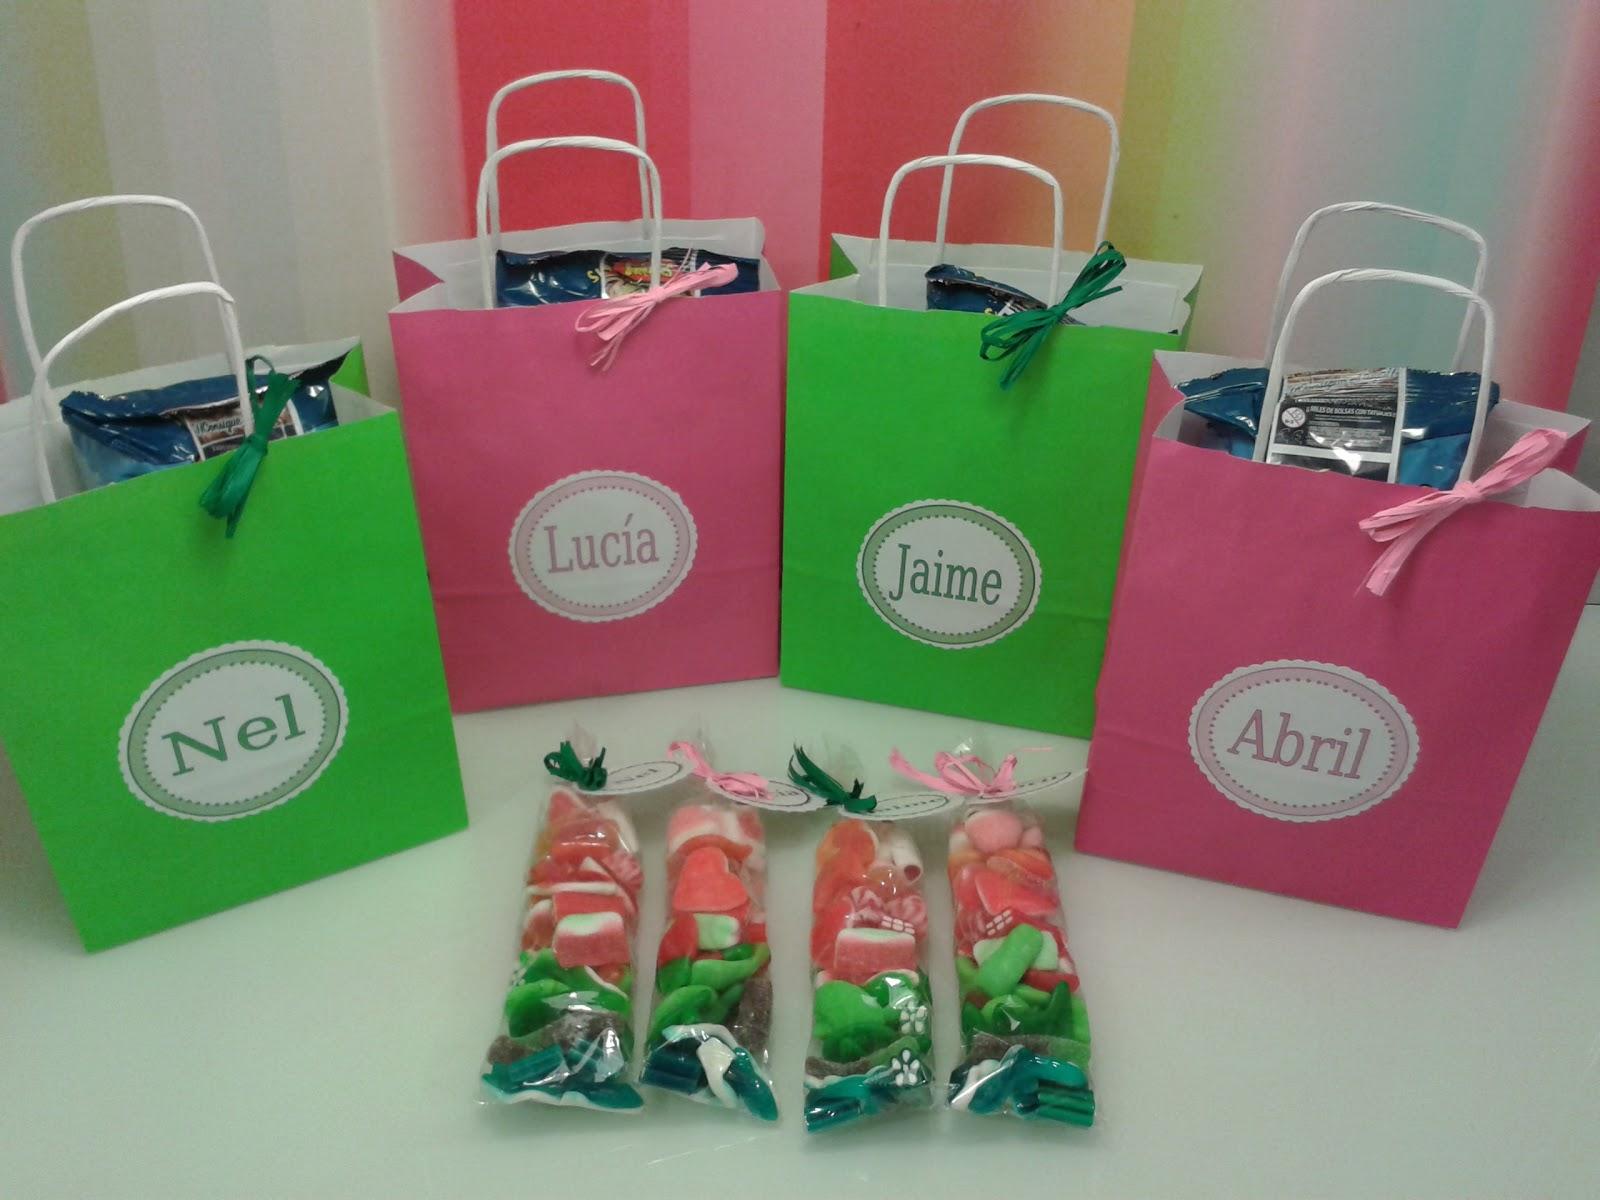 Chuchedetalles pamplona bolsas personalizadas de chuches - Bolsas de regalo personalizadas ...